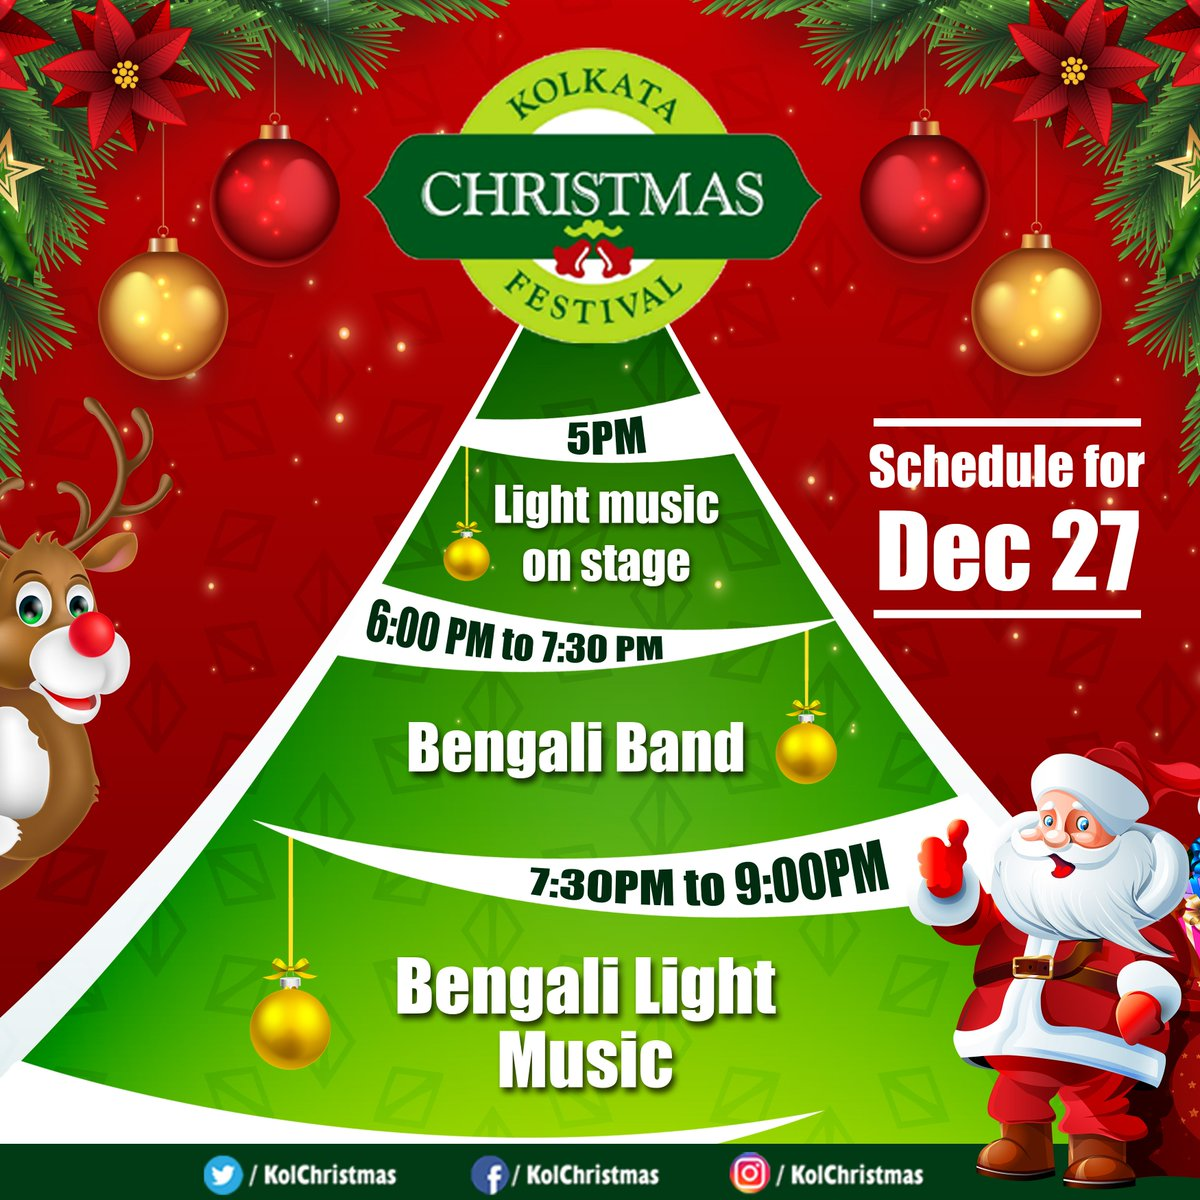 Kolkata Christmas on Twitter: \